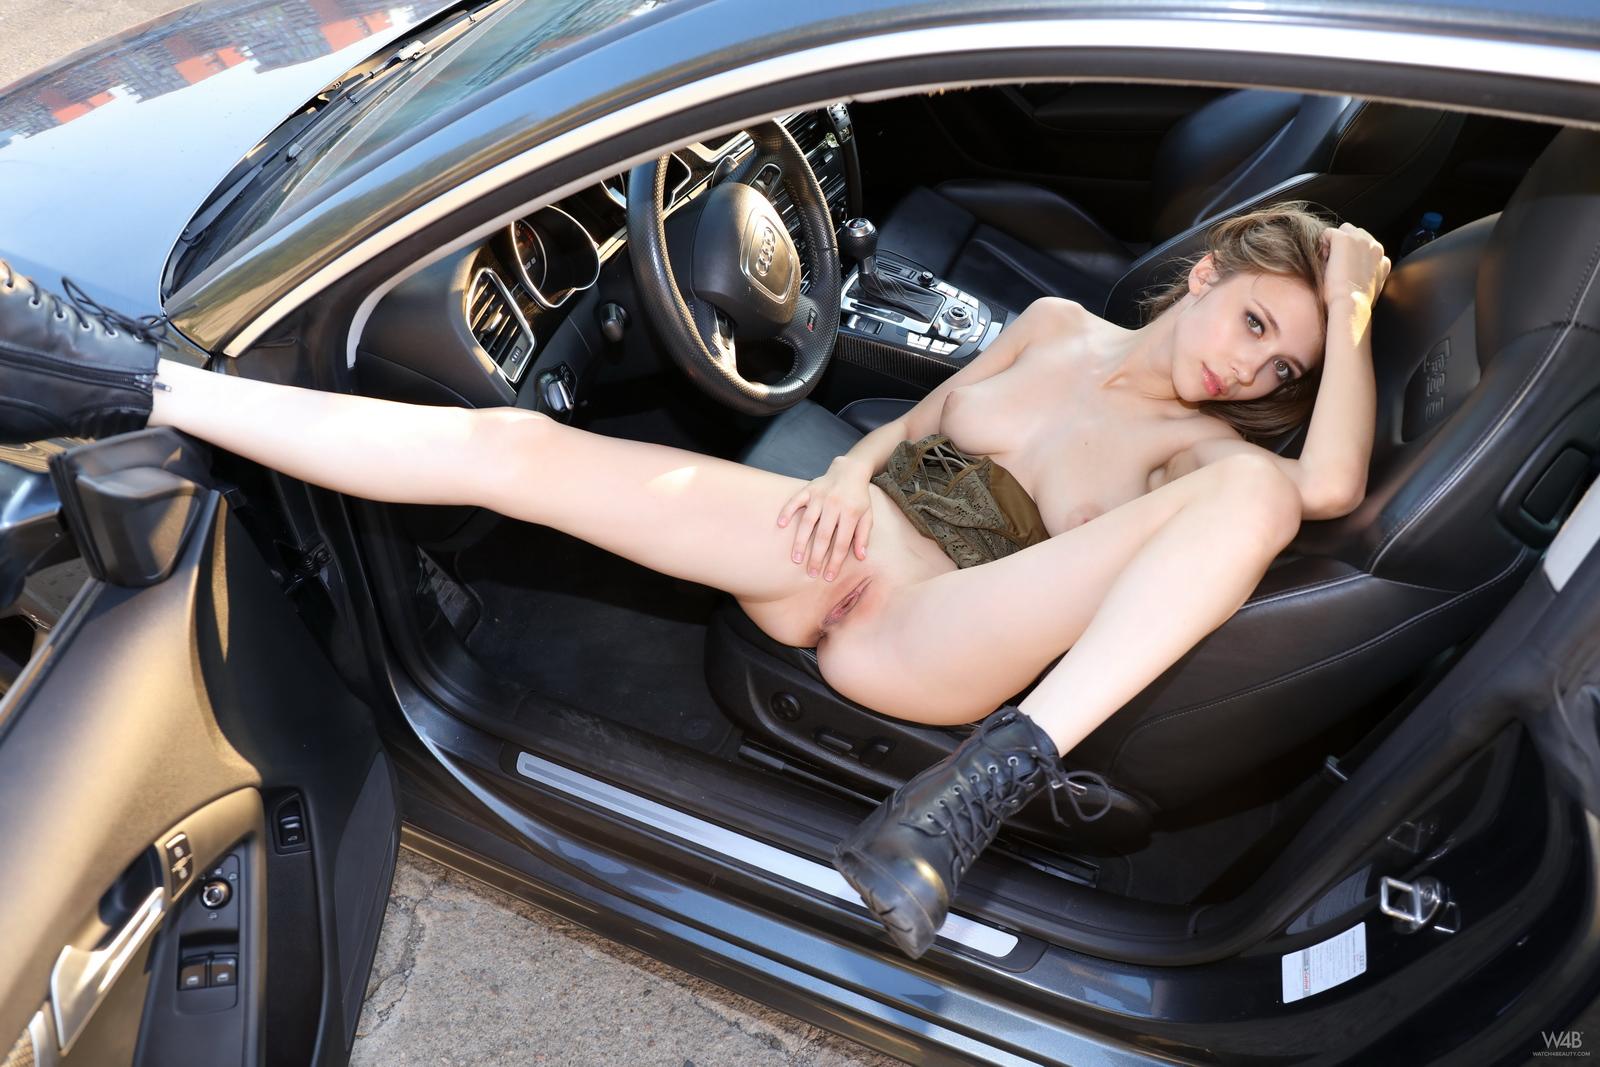 https://redbust.com/stuff/mila-azul-audi-rs5/milla-nude-audi-rs5-cars-pussy-watch4beauty-28.jpg